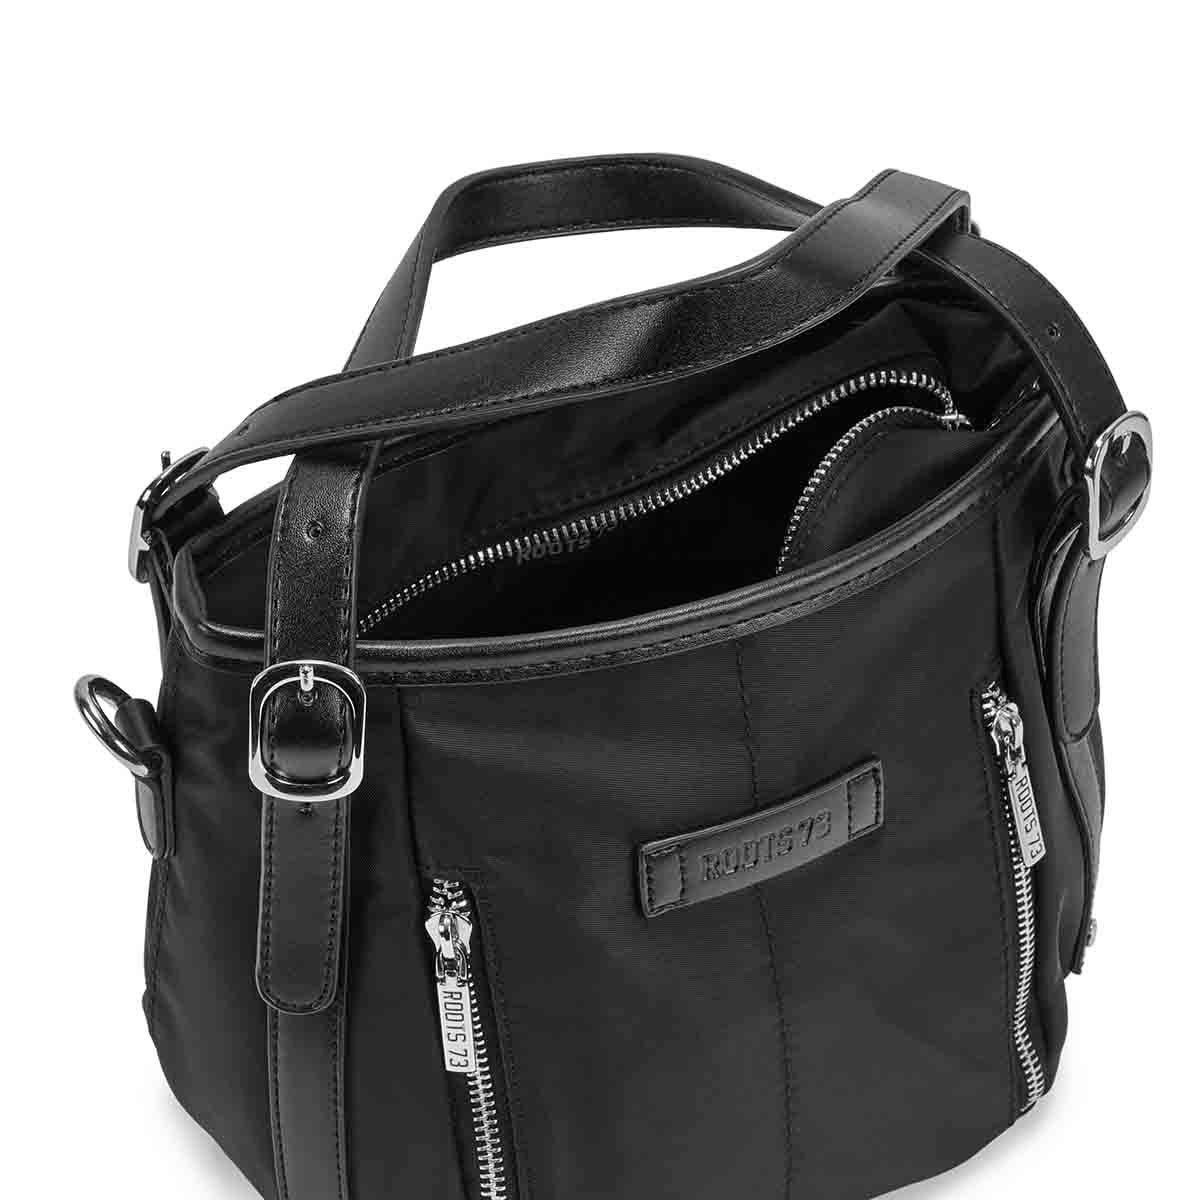 Lds Roots73 black small satchel